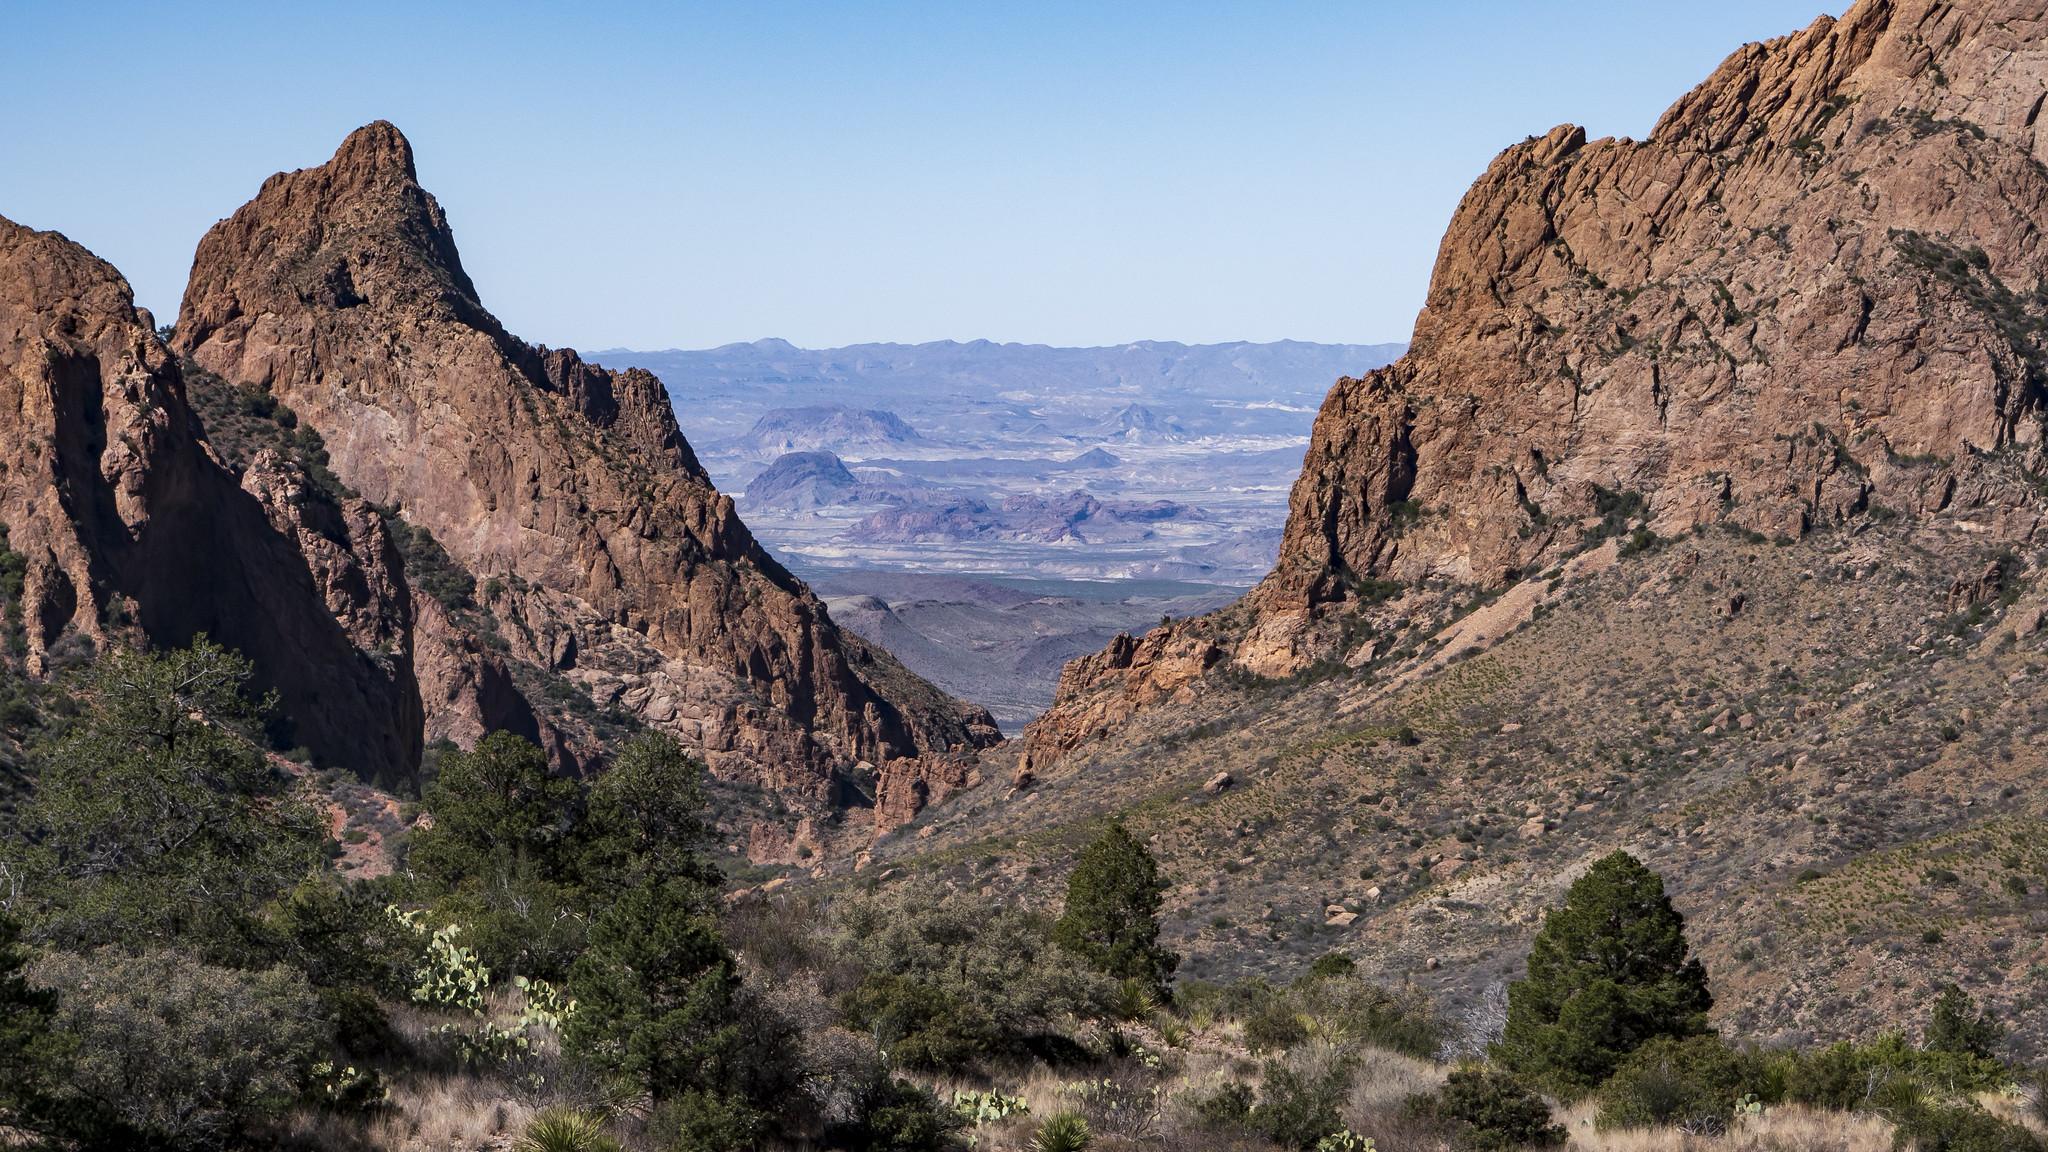 Nice Hiking Spot In Texas-Hike The Window Trail In Big Bend